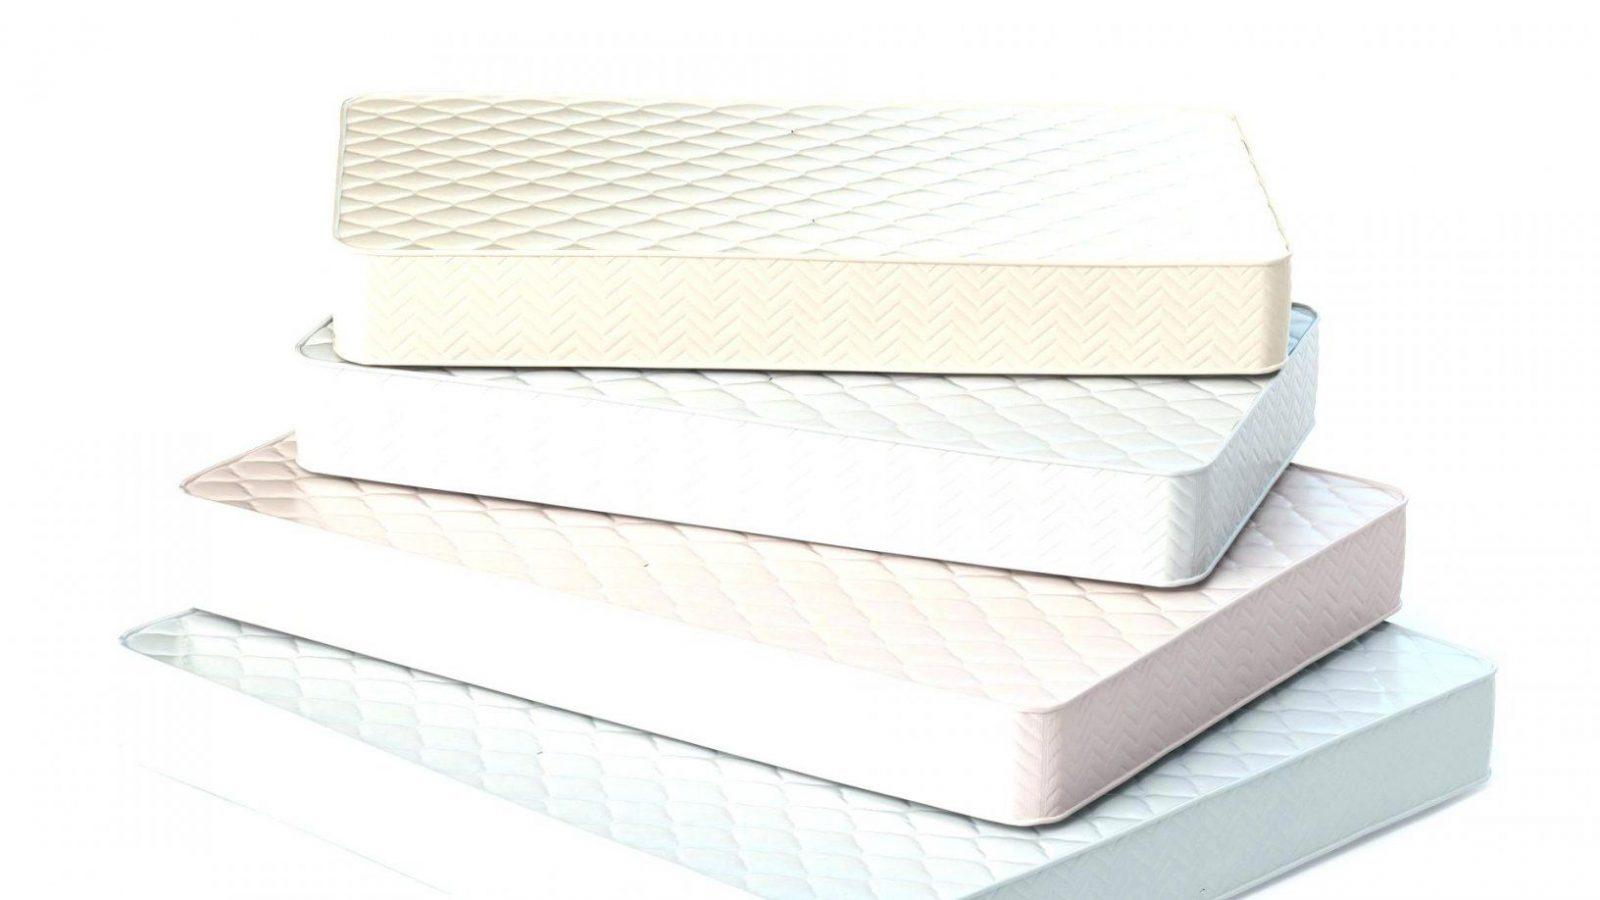 Aldi Matratzen Matratze Im Angebot 2016 Test Memofit 140×200 2015 von Memofit Matratze Aldi Bild